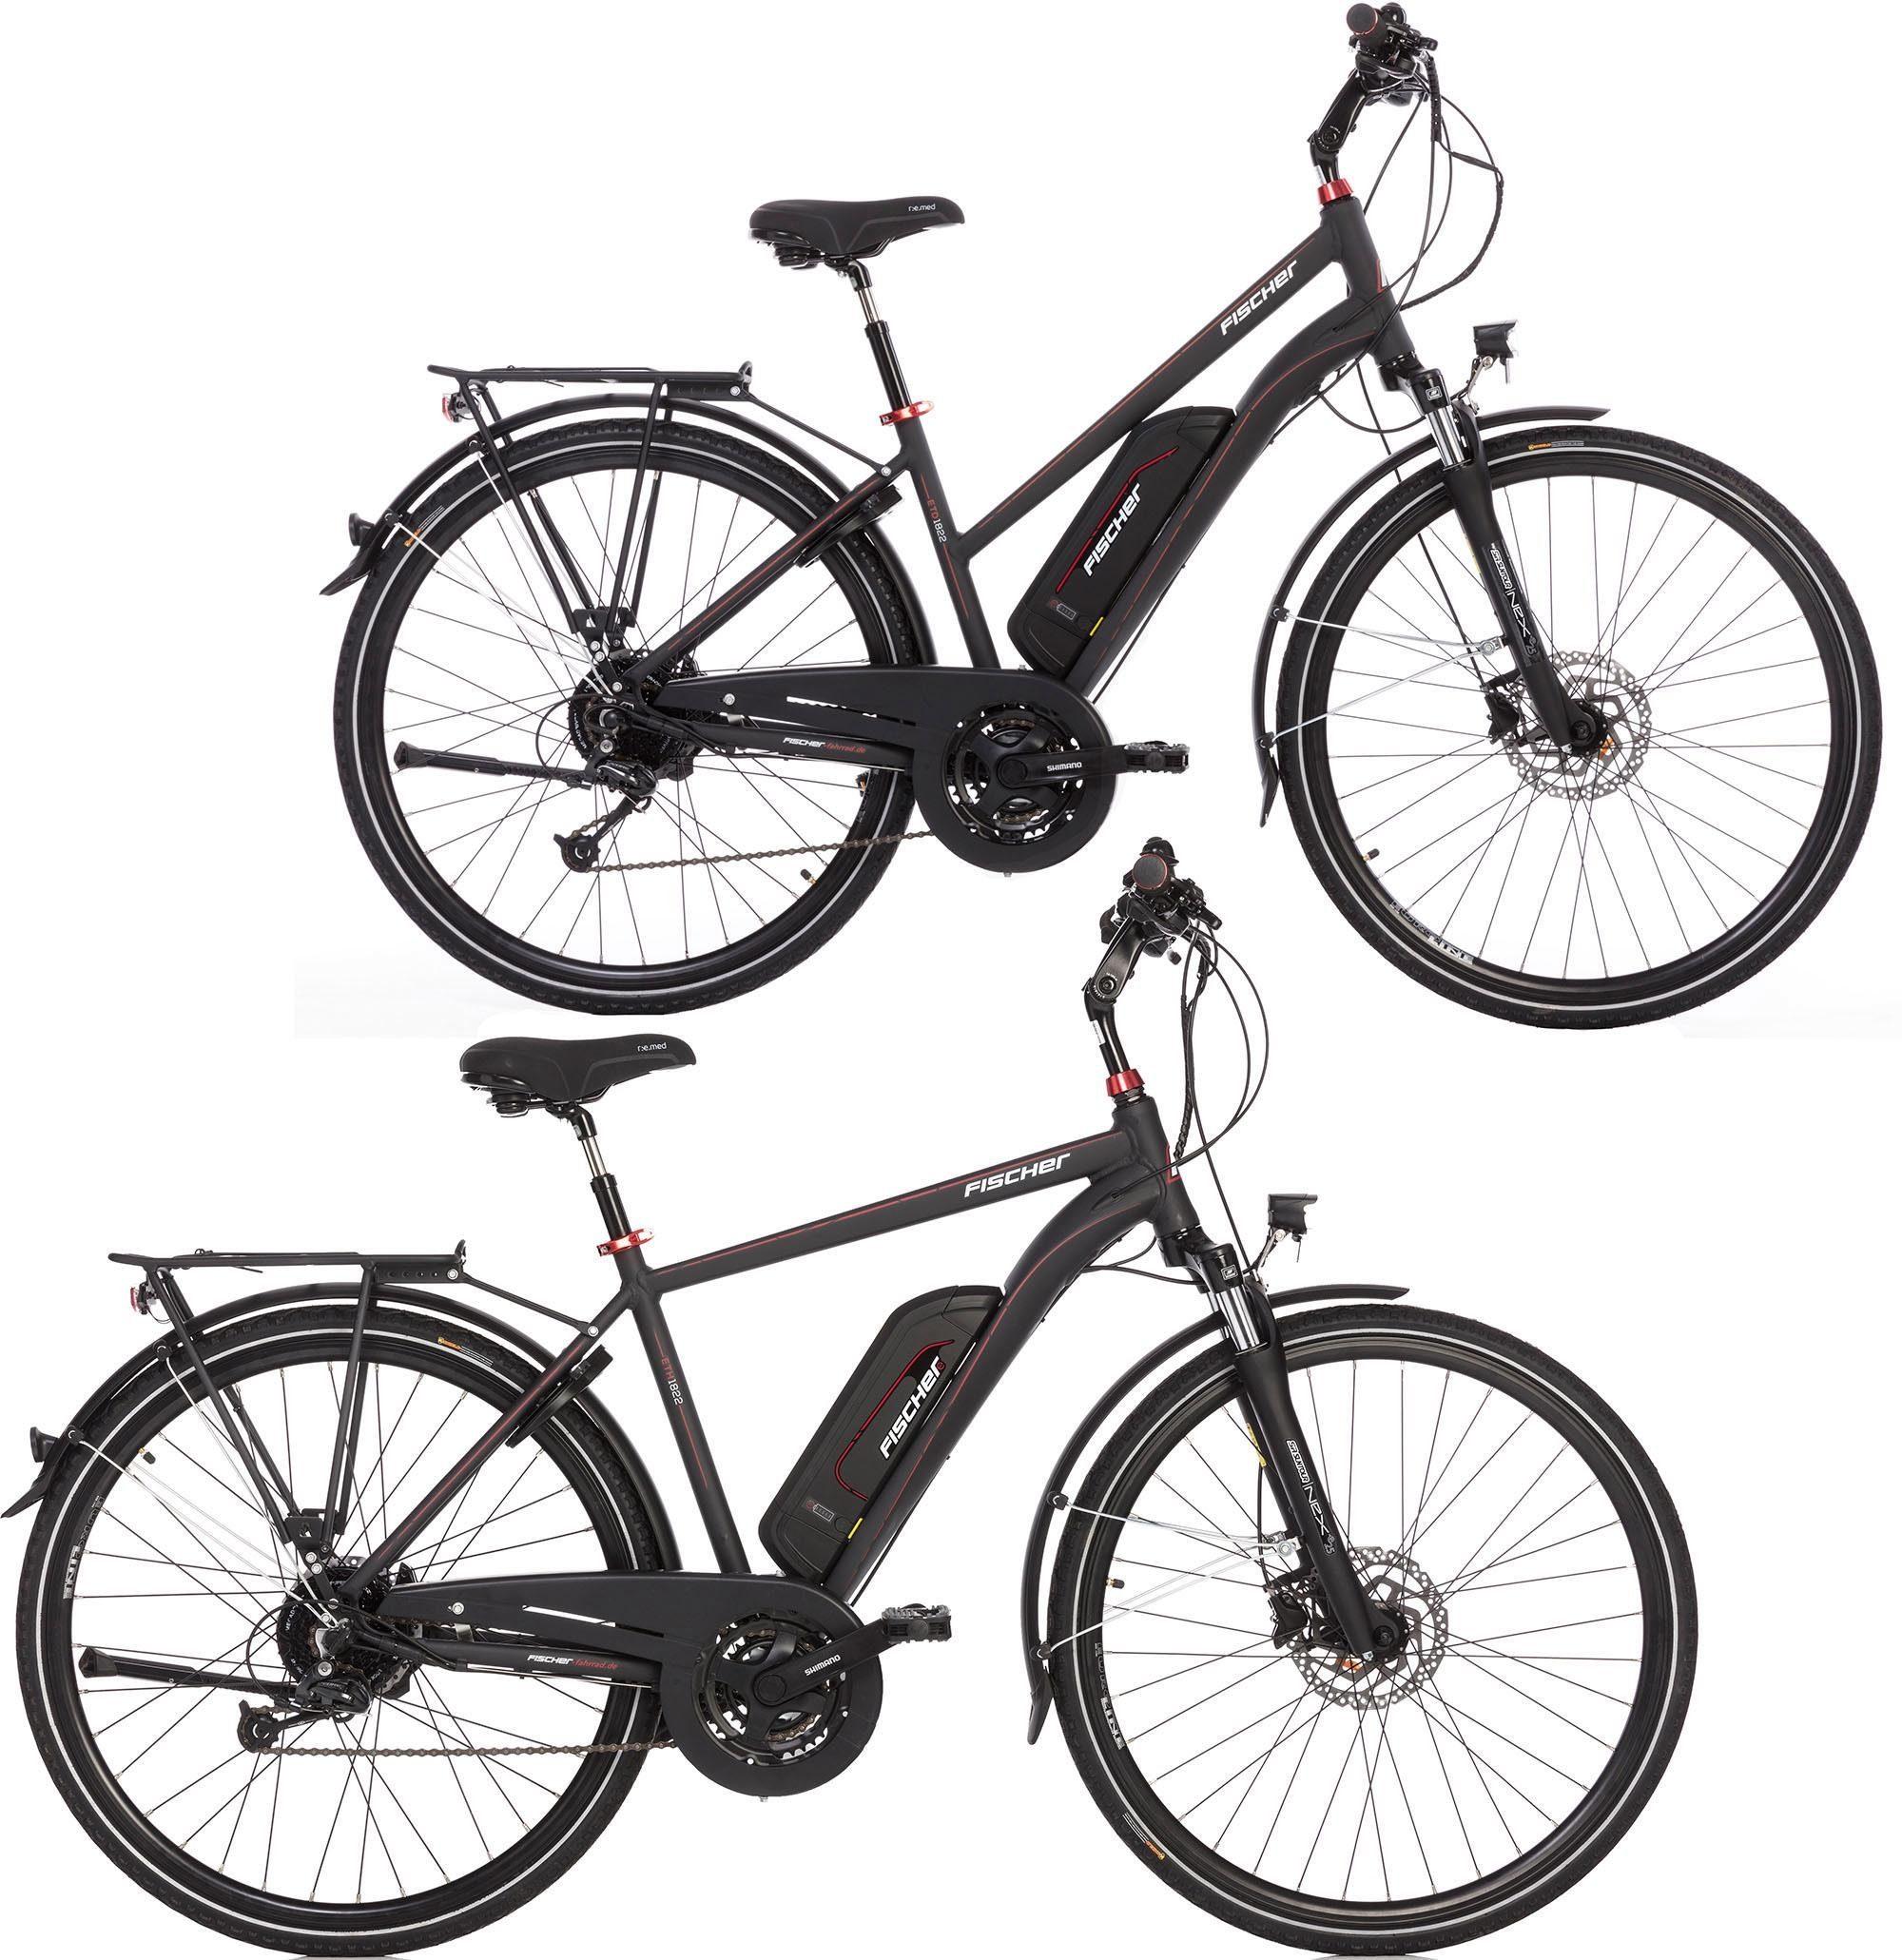 Fischer Fahrräder E-Bike »ETD/ETH 1822«, 24 Gang Shimano Deore Schaltwerk, Kettenschaltung, Heckmotor 250 W, (Spar-Set)